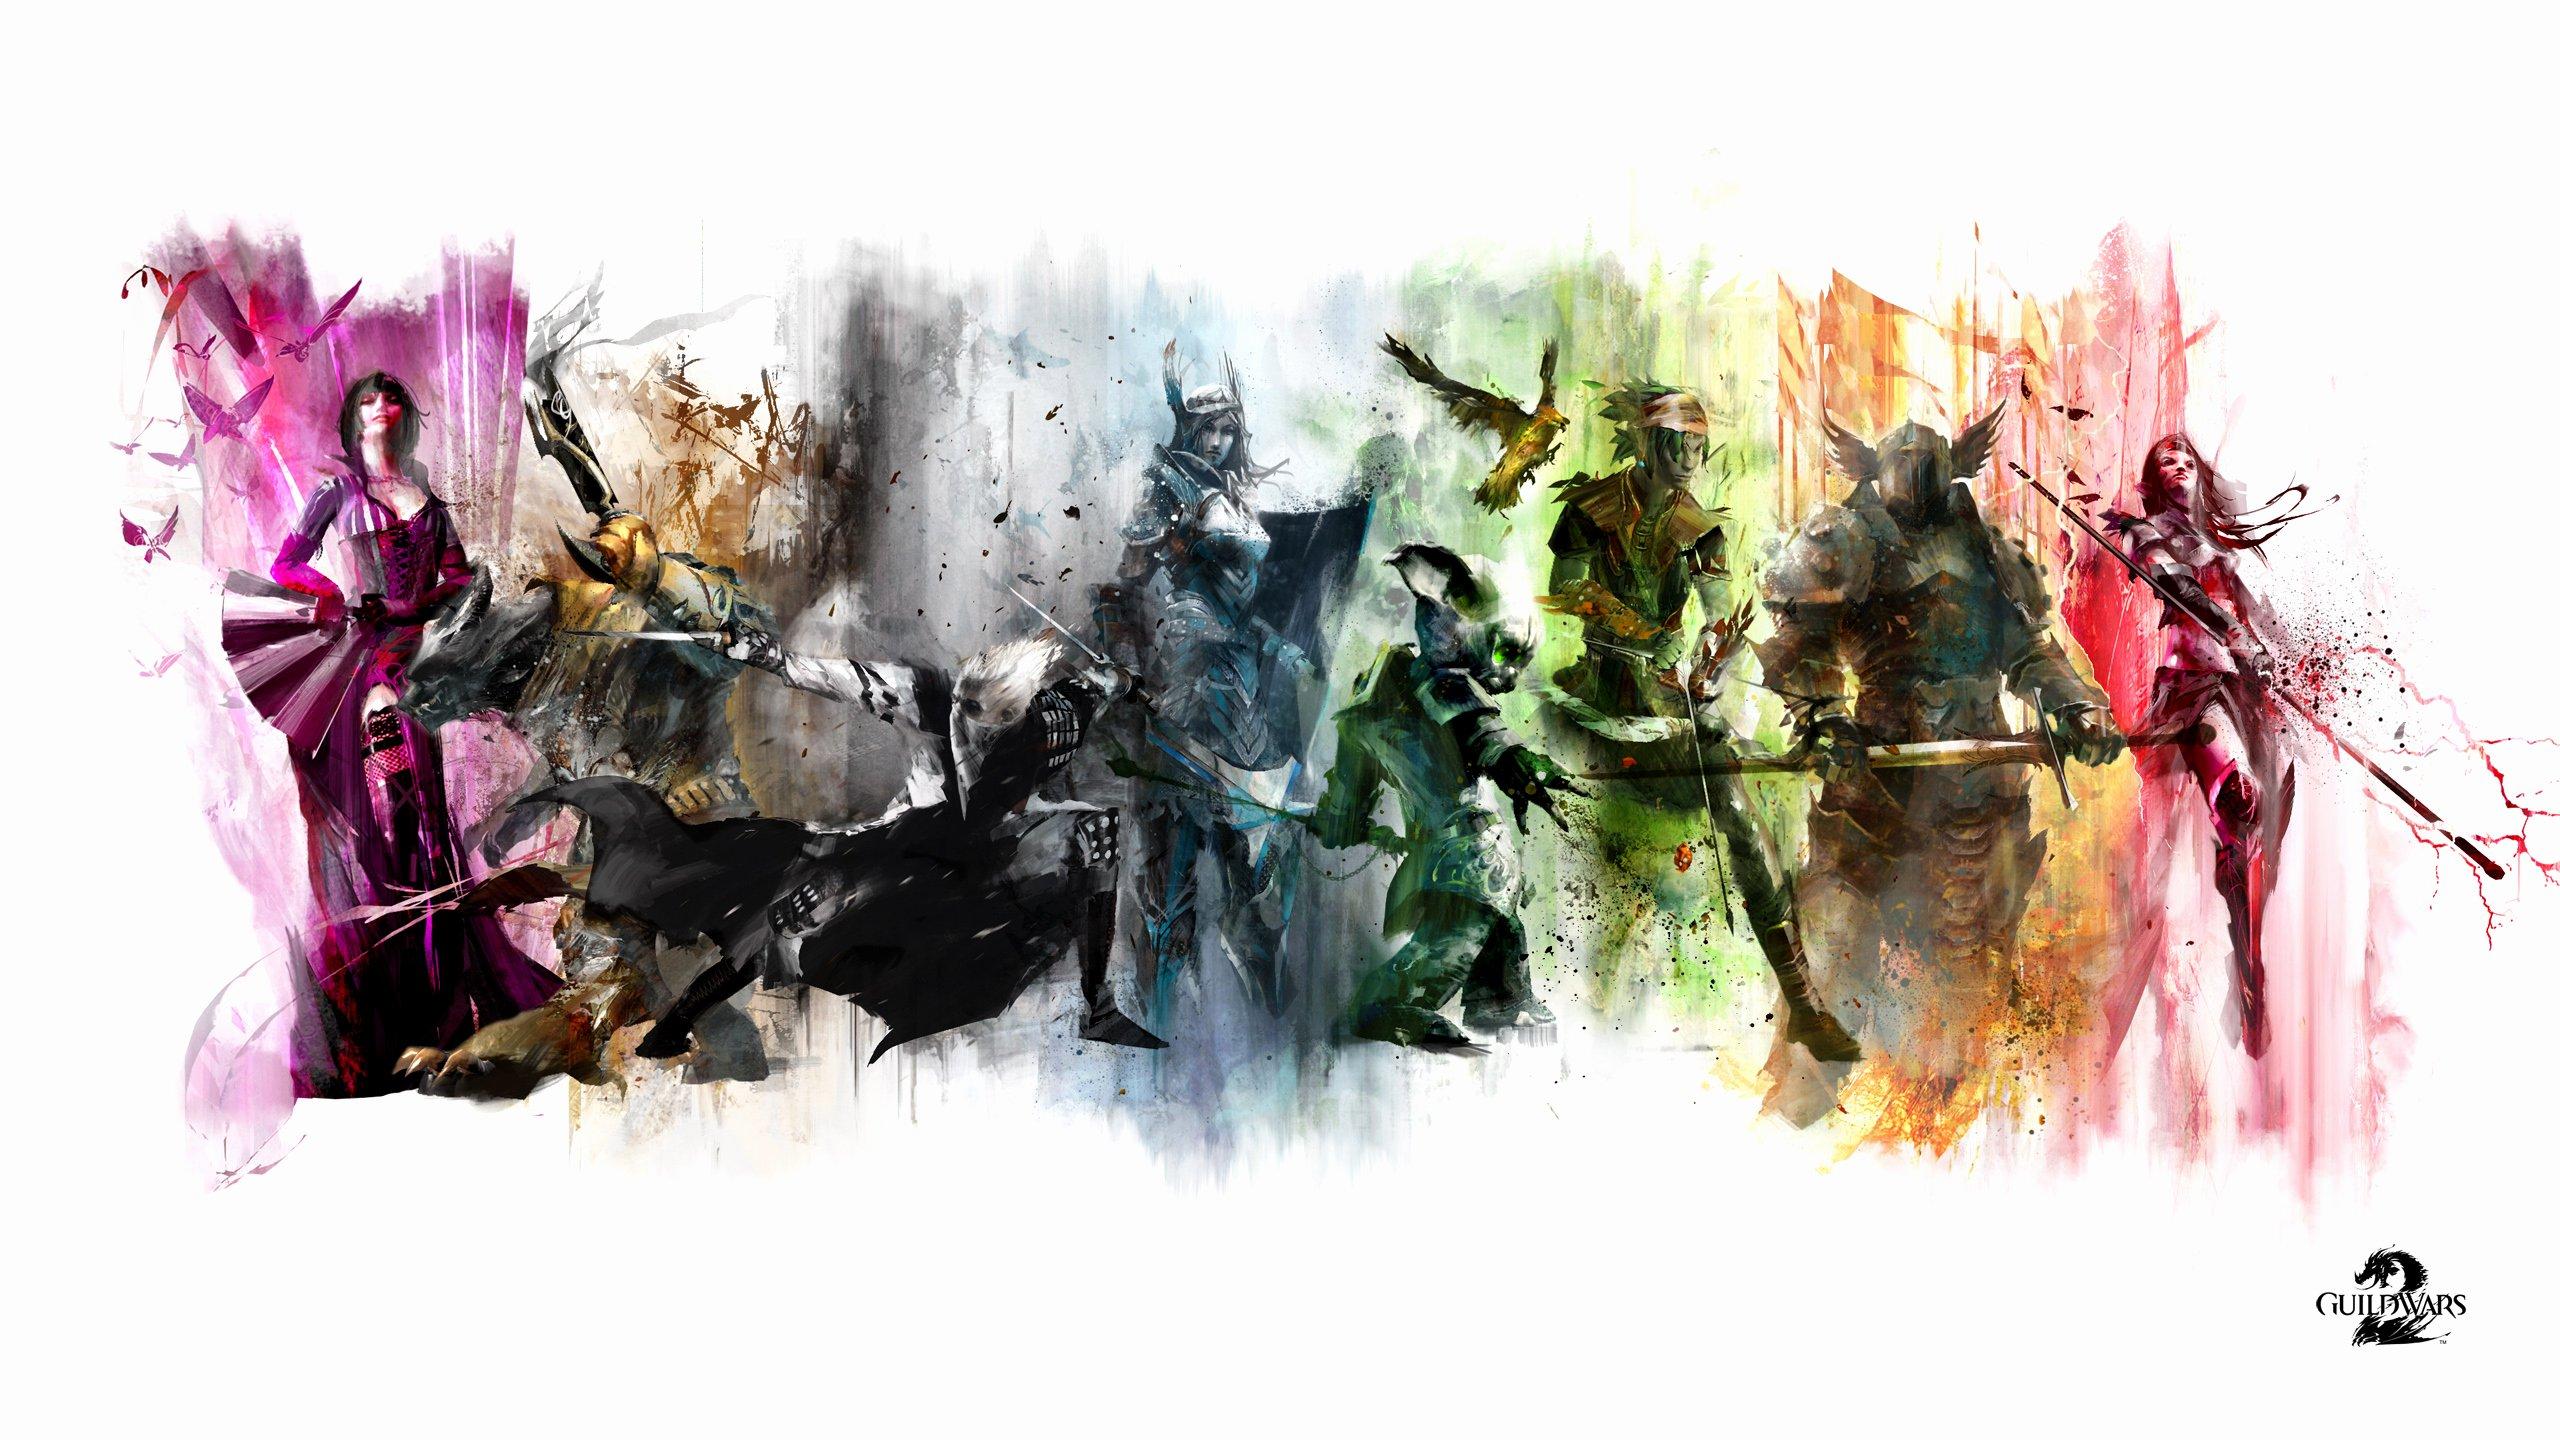 Youtube Channel Art Backgrounds Lovely [49 ] 2048x1152 Channel Art Wallpaper On